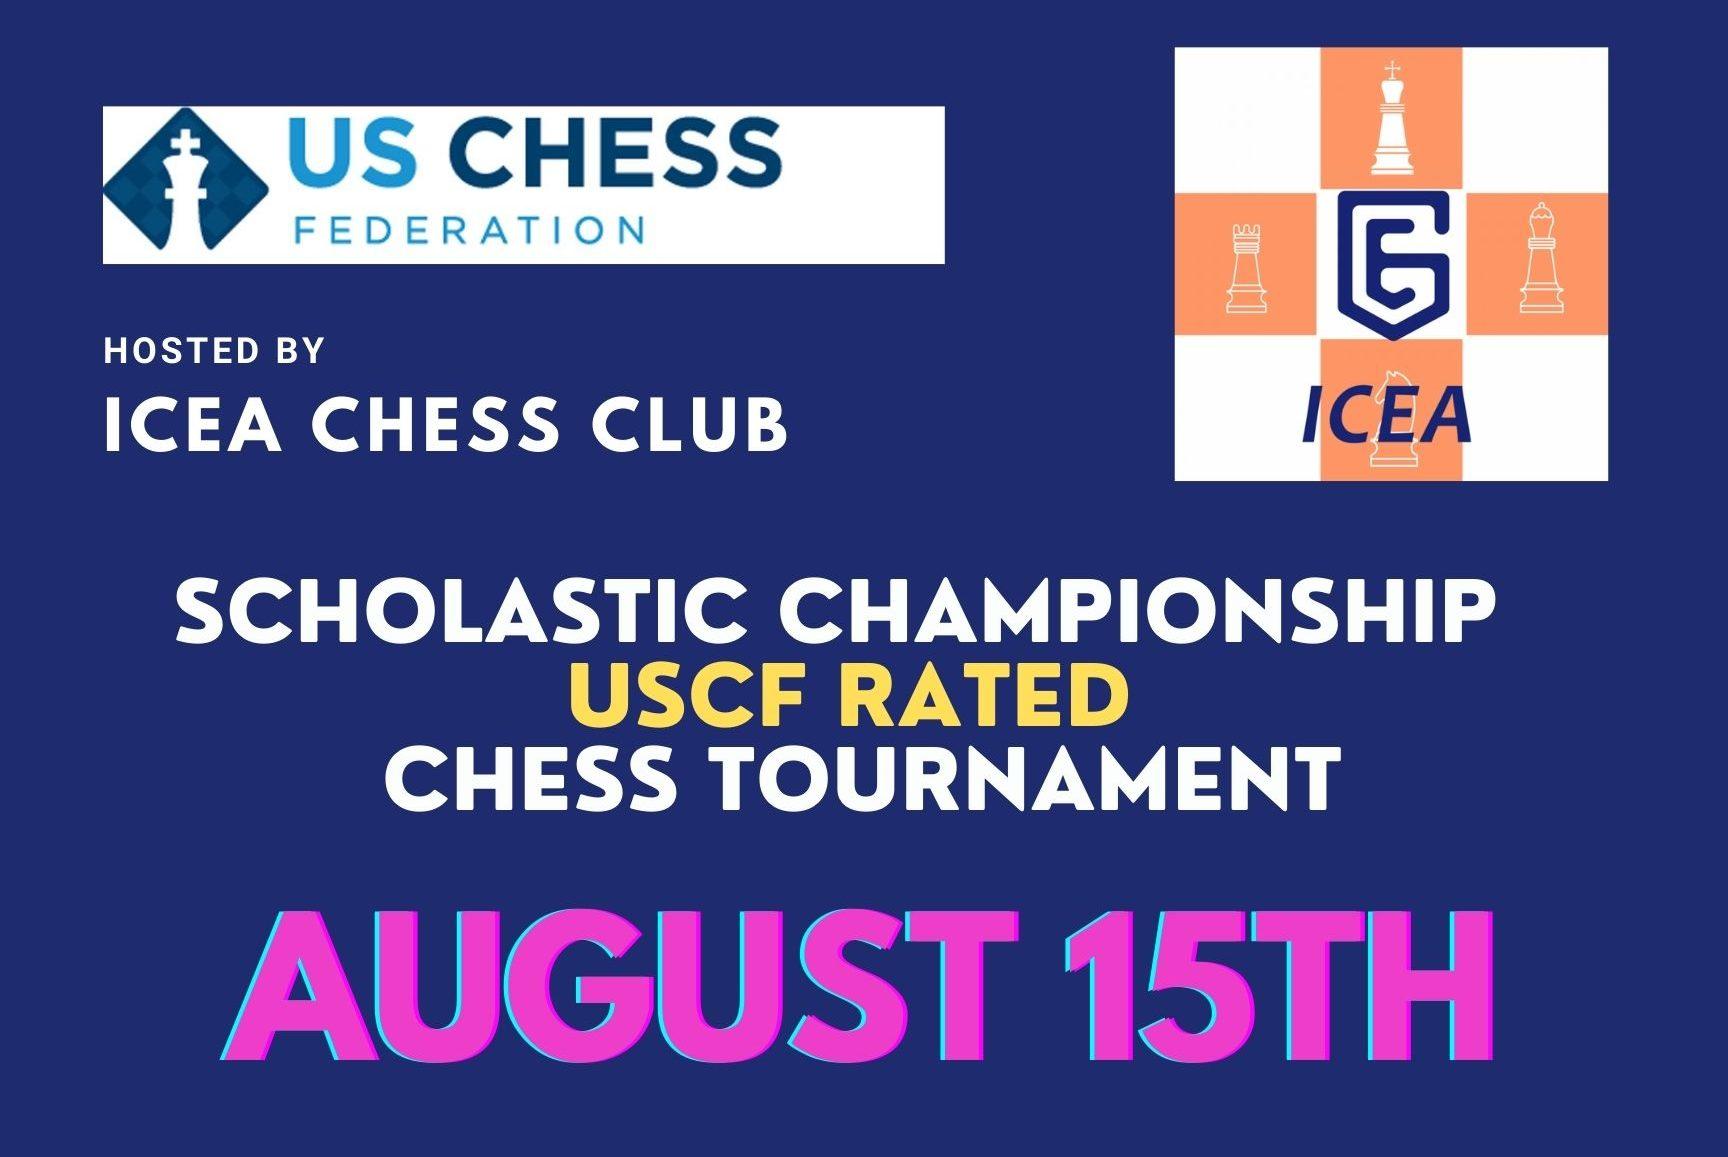 ICEA August Scholastic Championship Chess Tournament